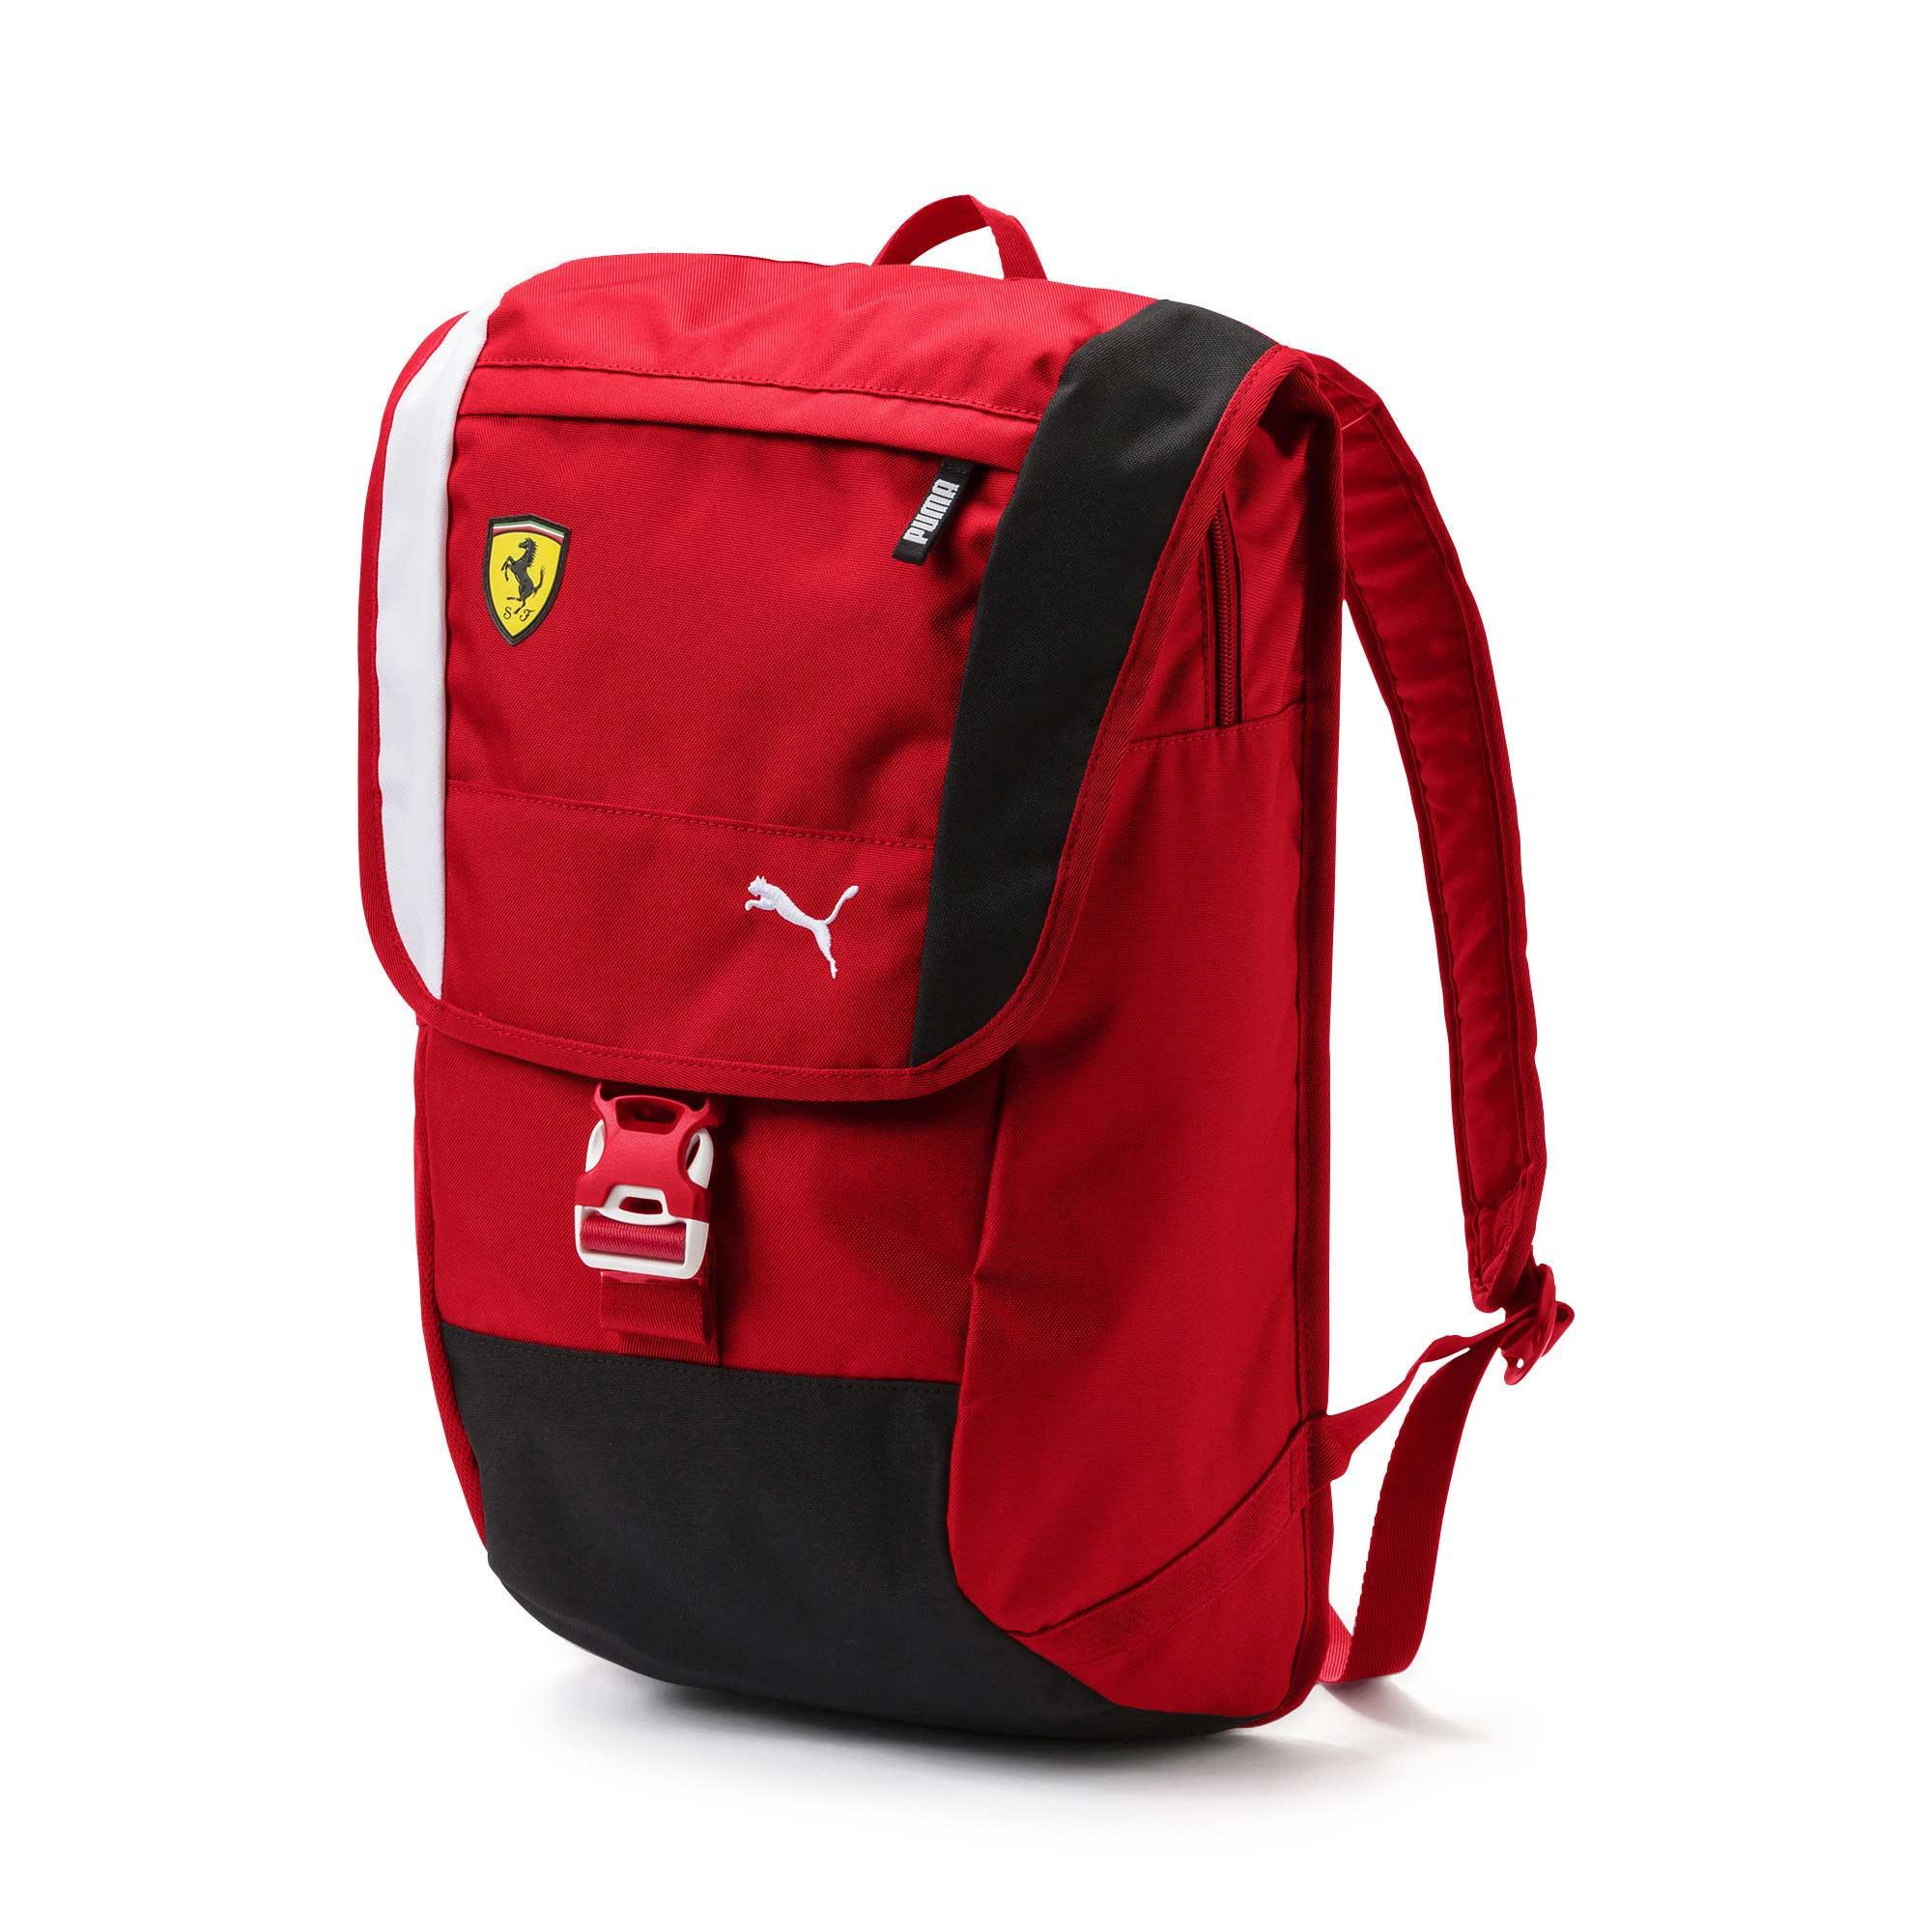 8eae14cc8 Scuderia Ferrari Puma backpack